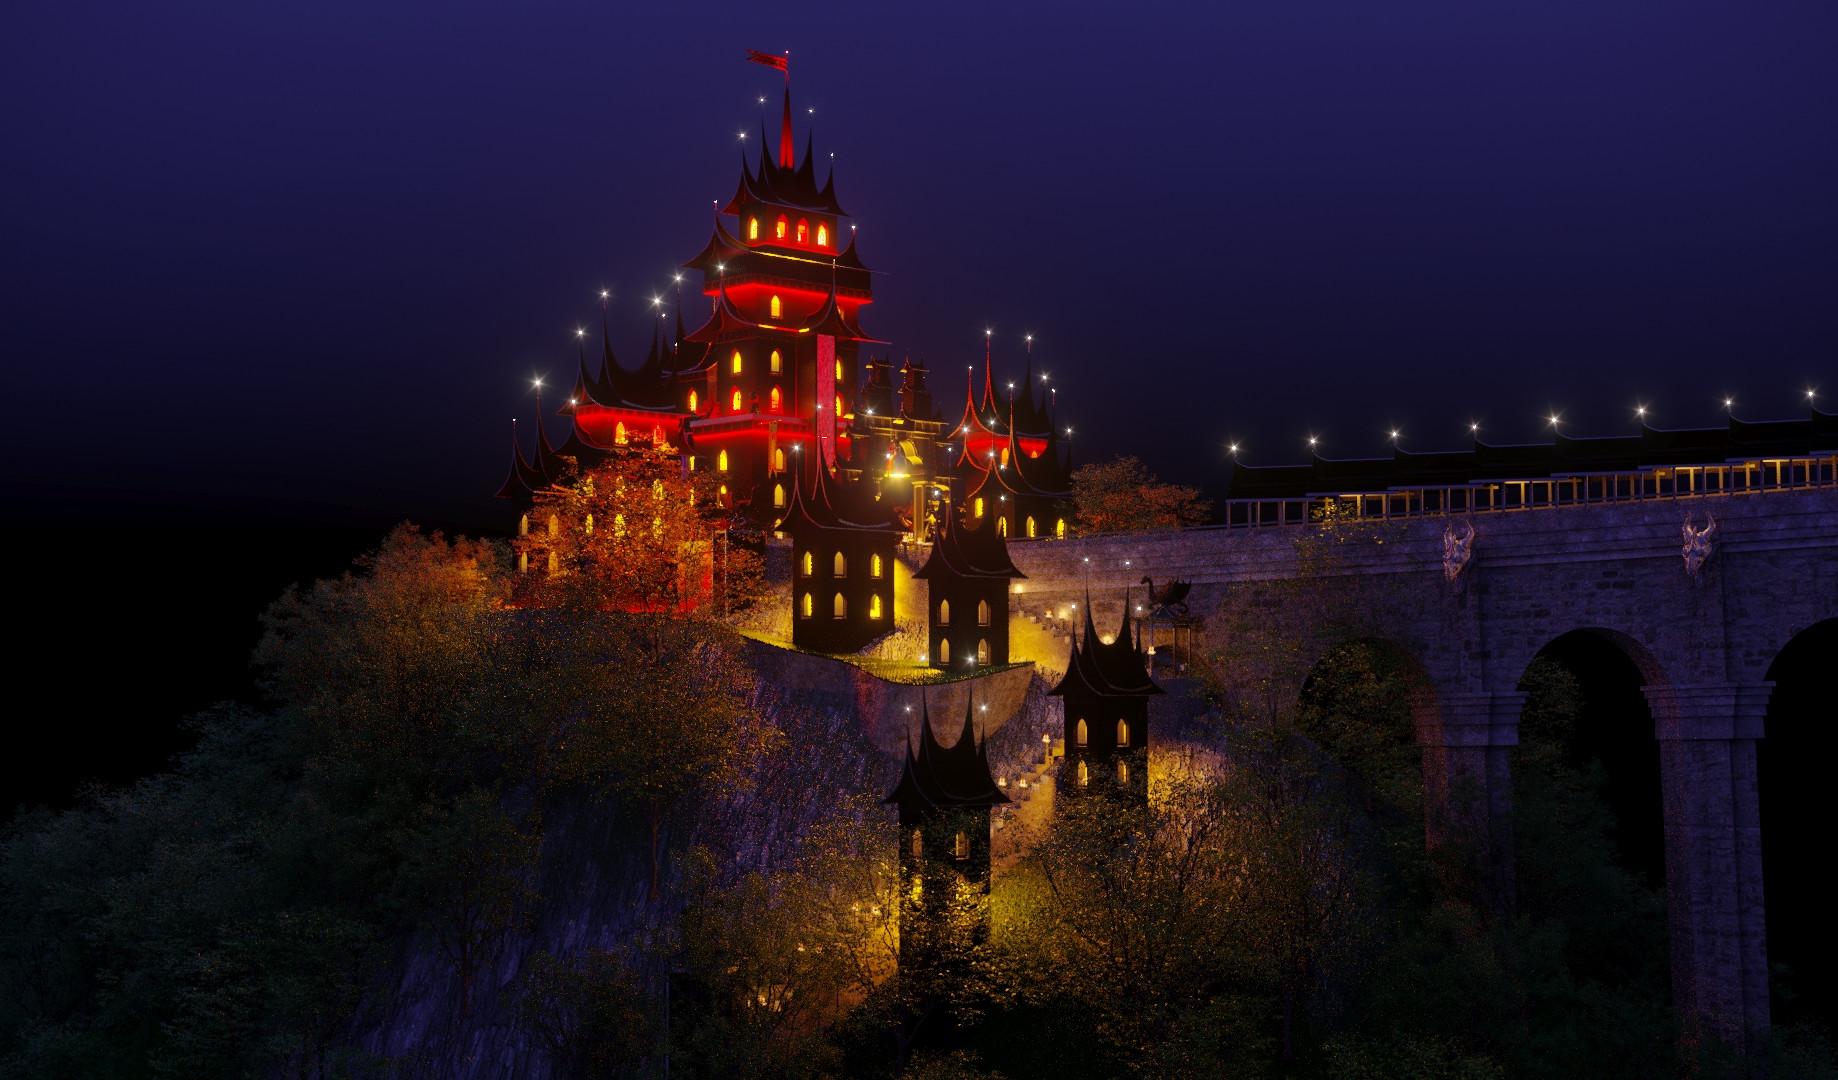 Замок Принца горы Абанг